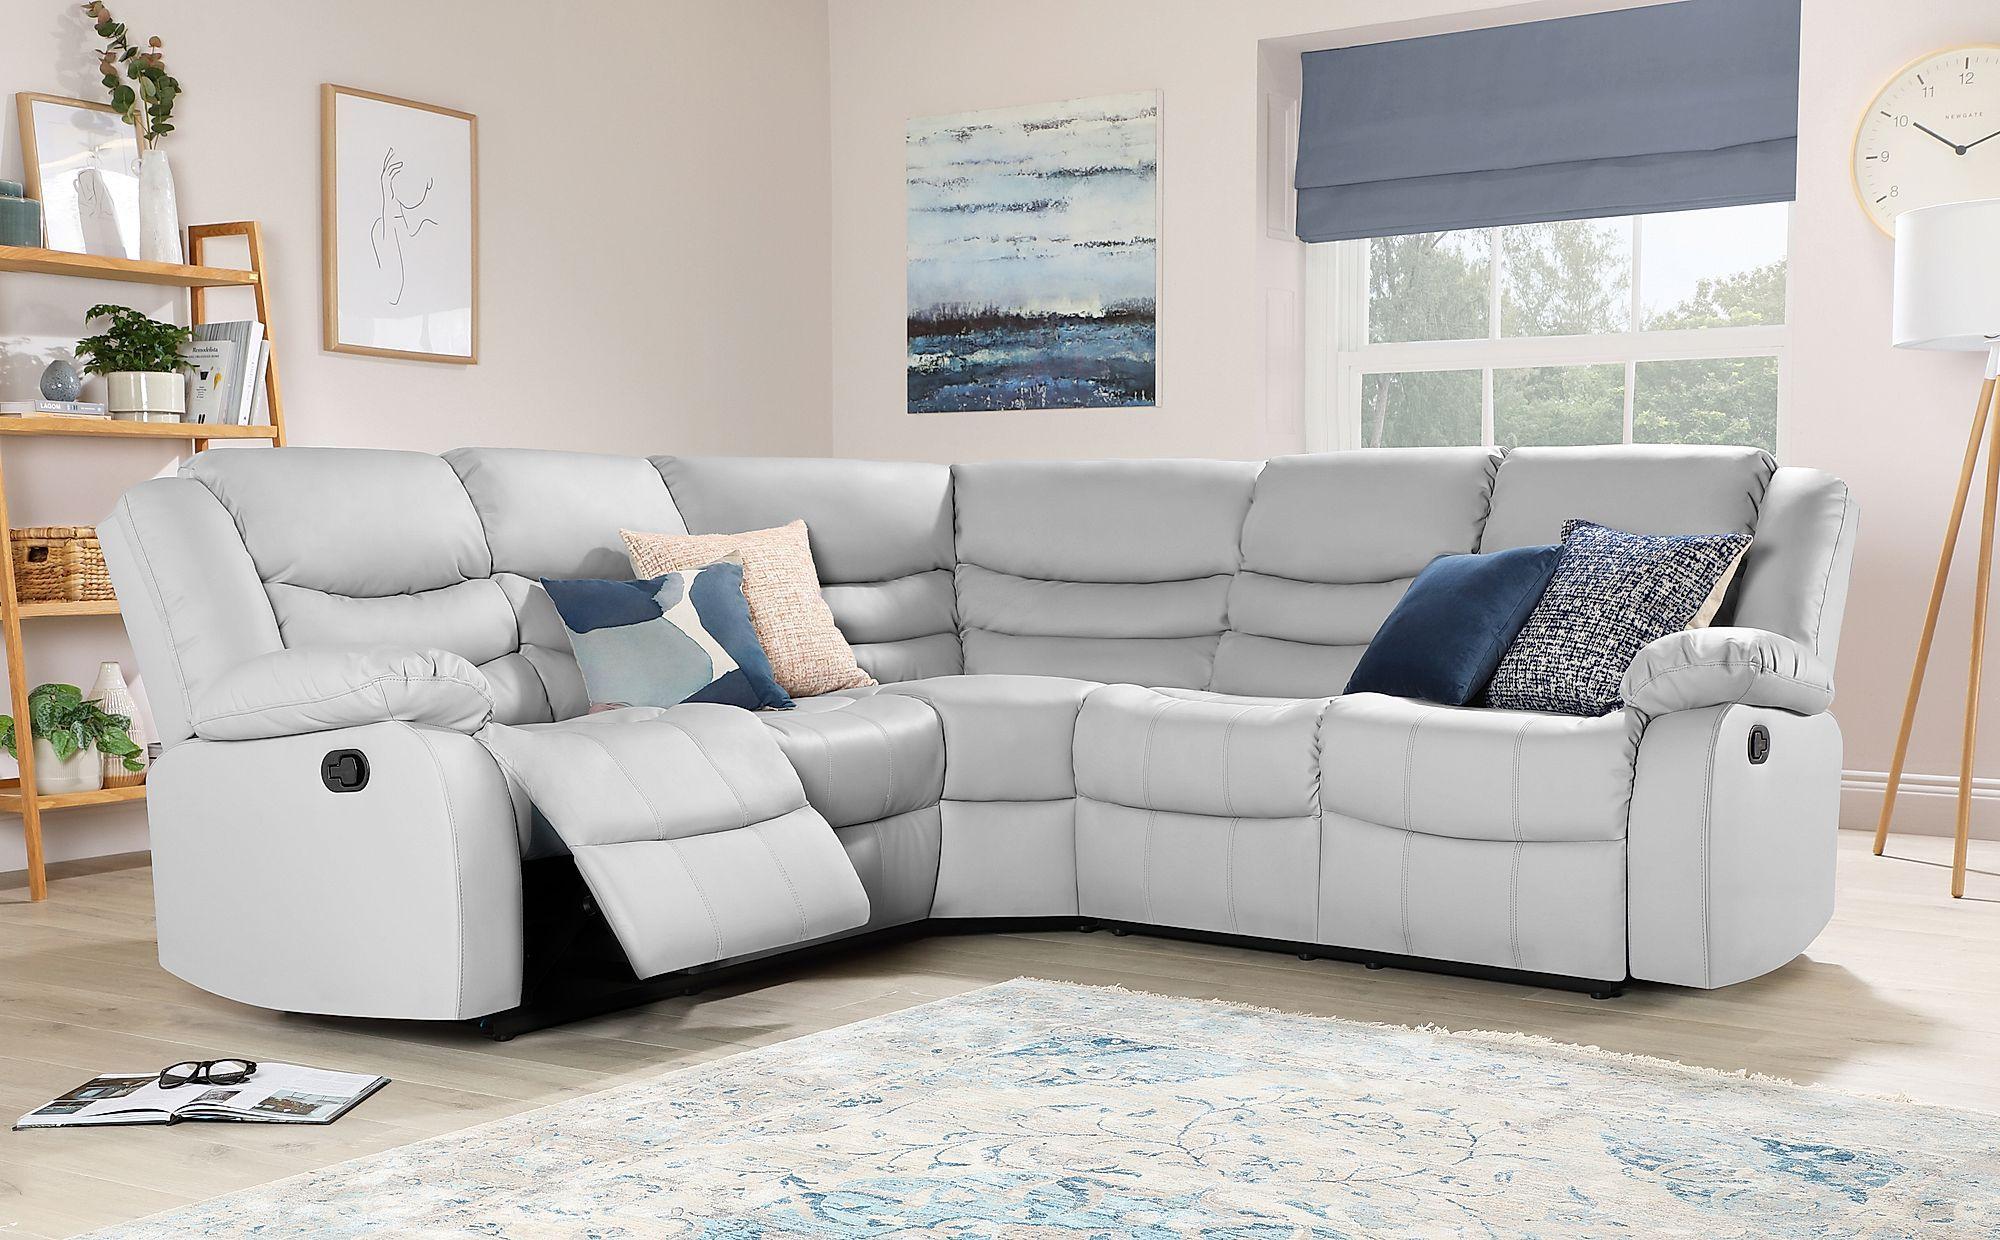 Best Sorrento Light Grey Leather Recliner Corner Sofa In 2020 400 x 300